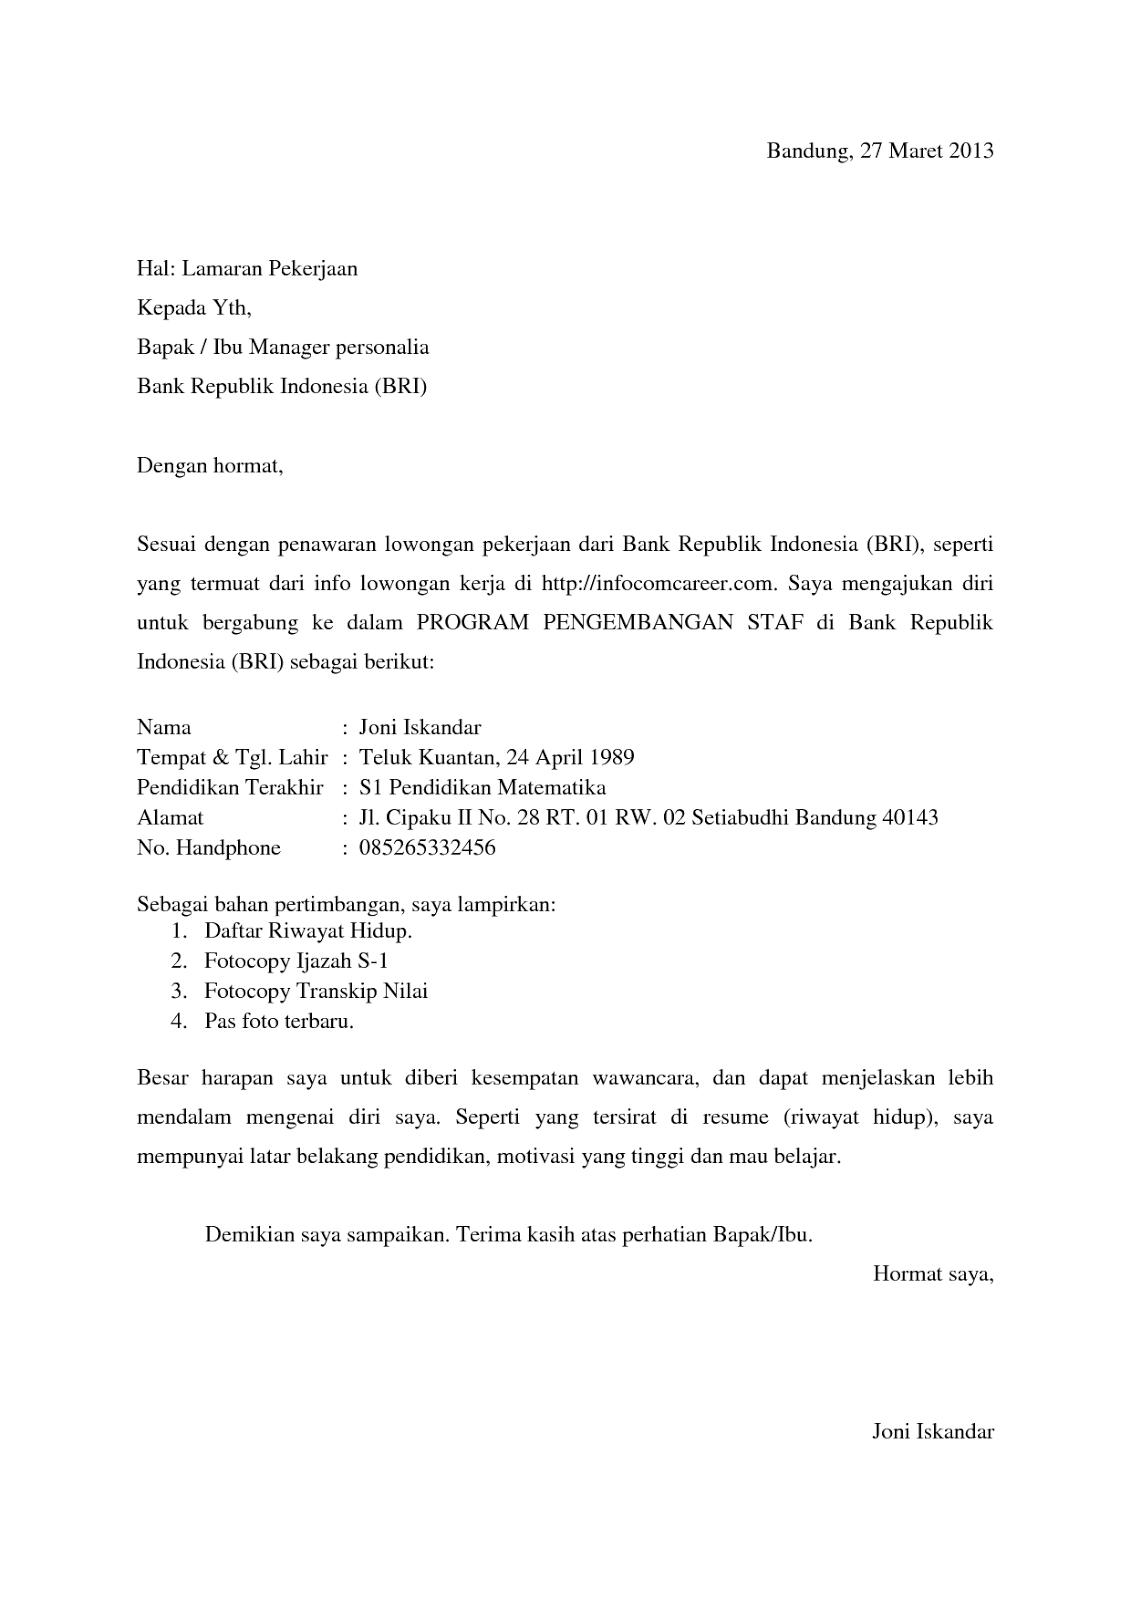 Surat Lamaran Kerja Bank BRI Surat, Cv kreatif, Riwayat